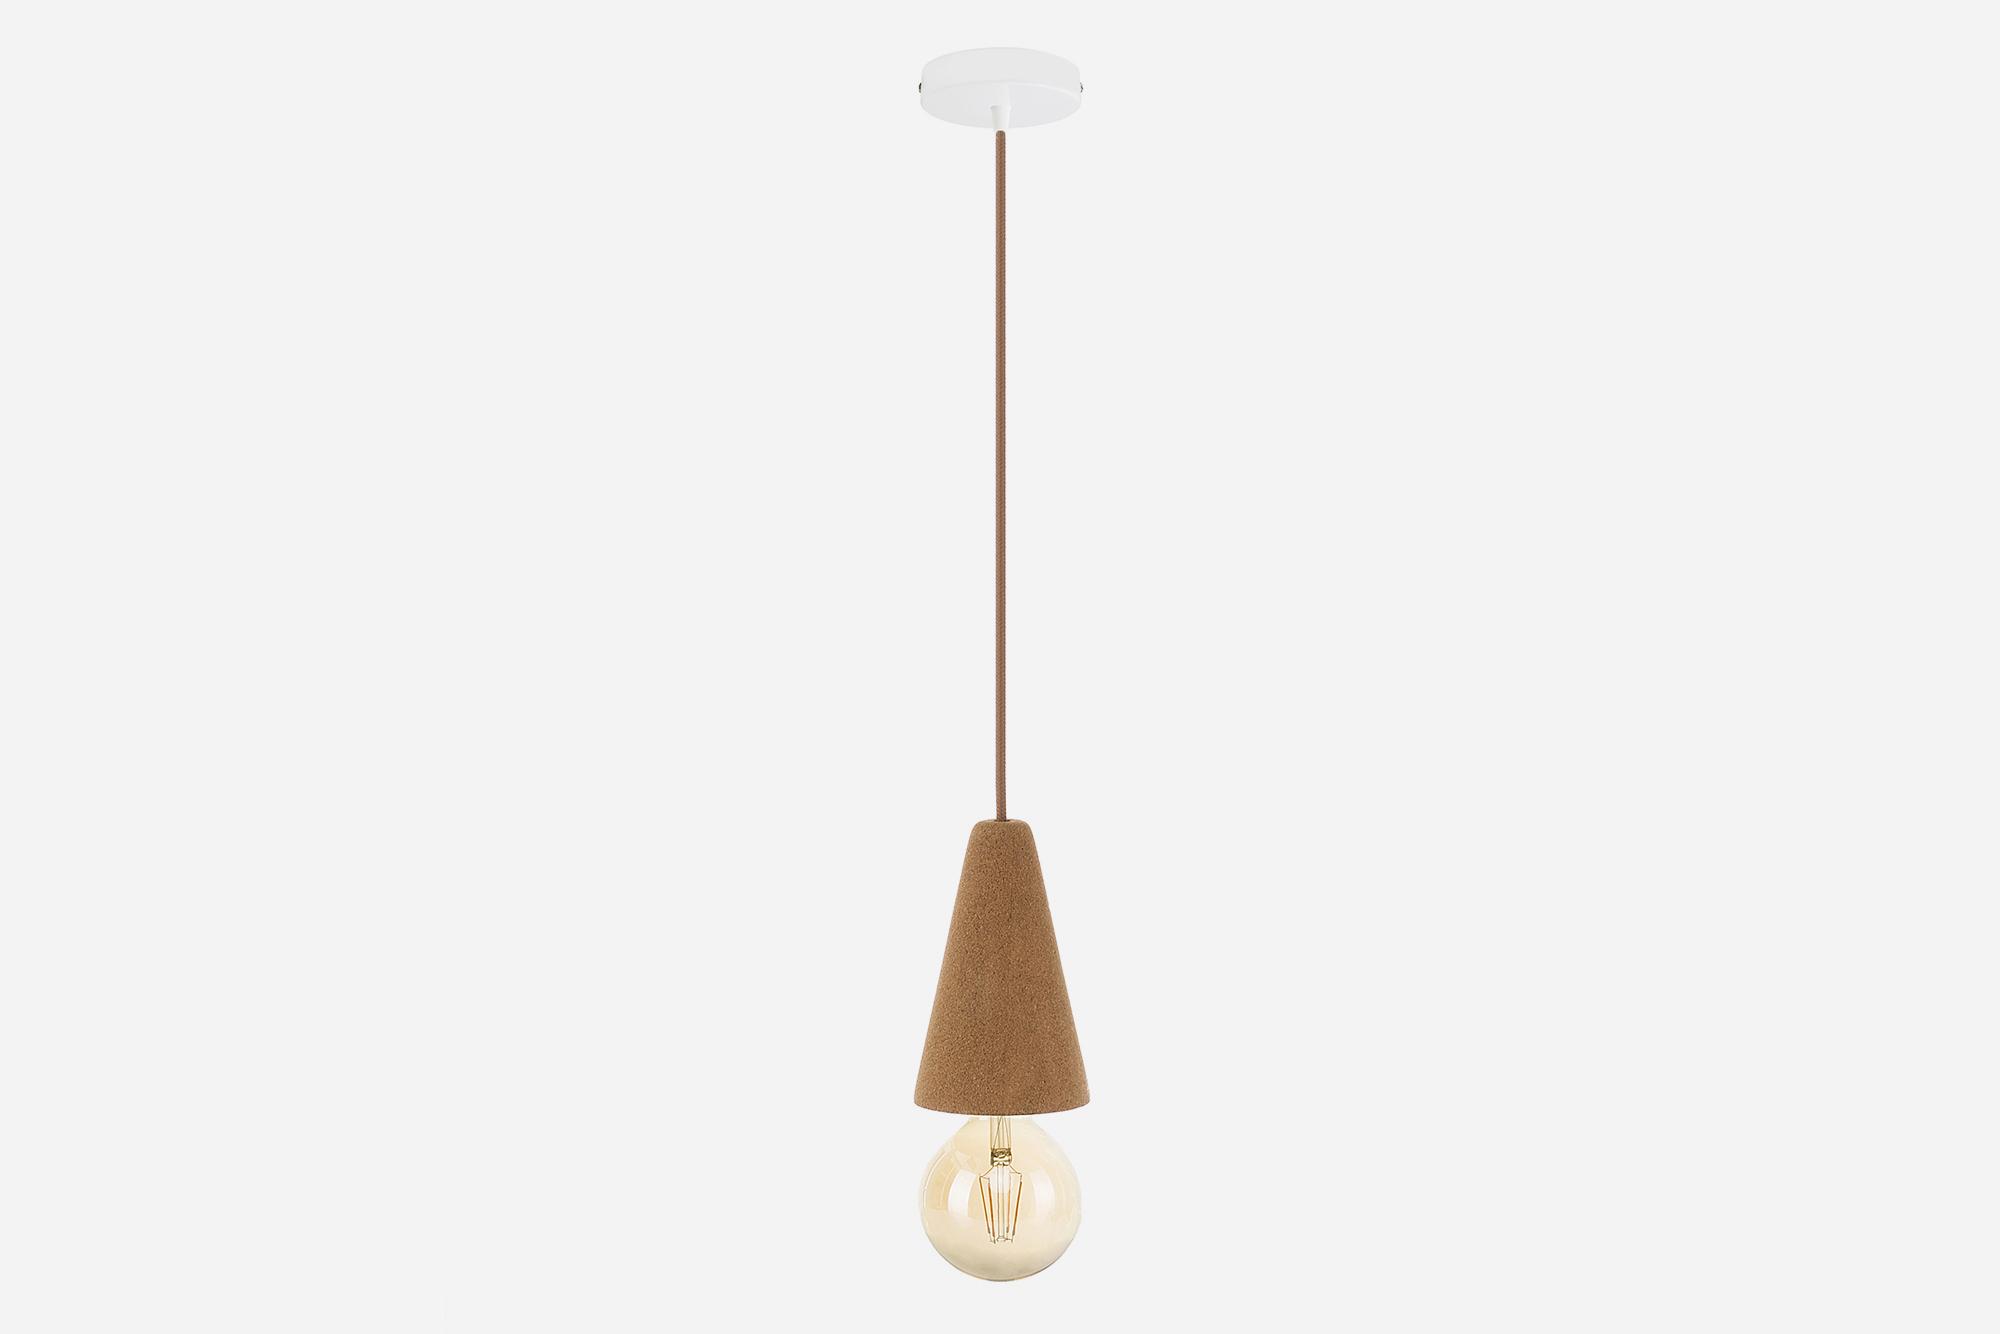 low-grey-Galula-Sino-lamp-light-cork-solo-ceiling-rose.jpg